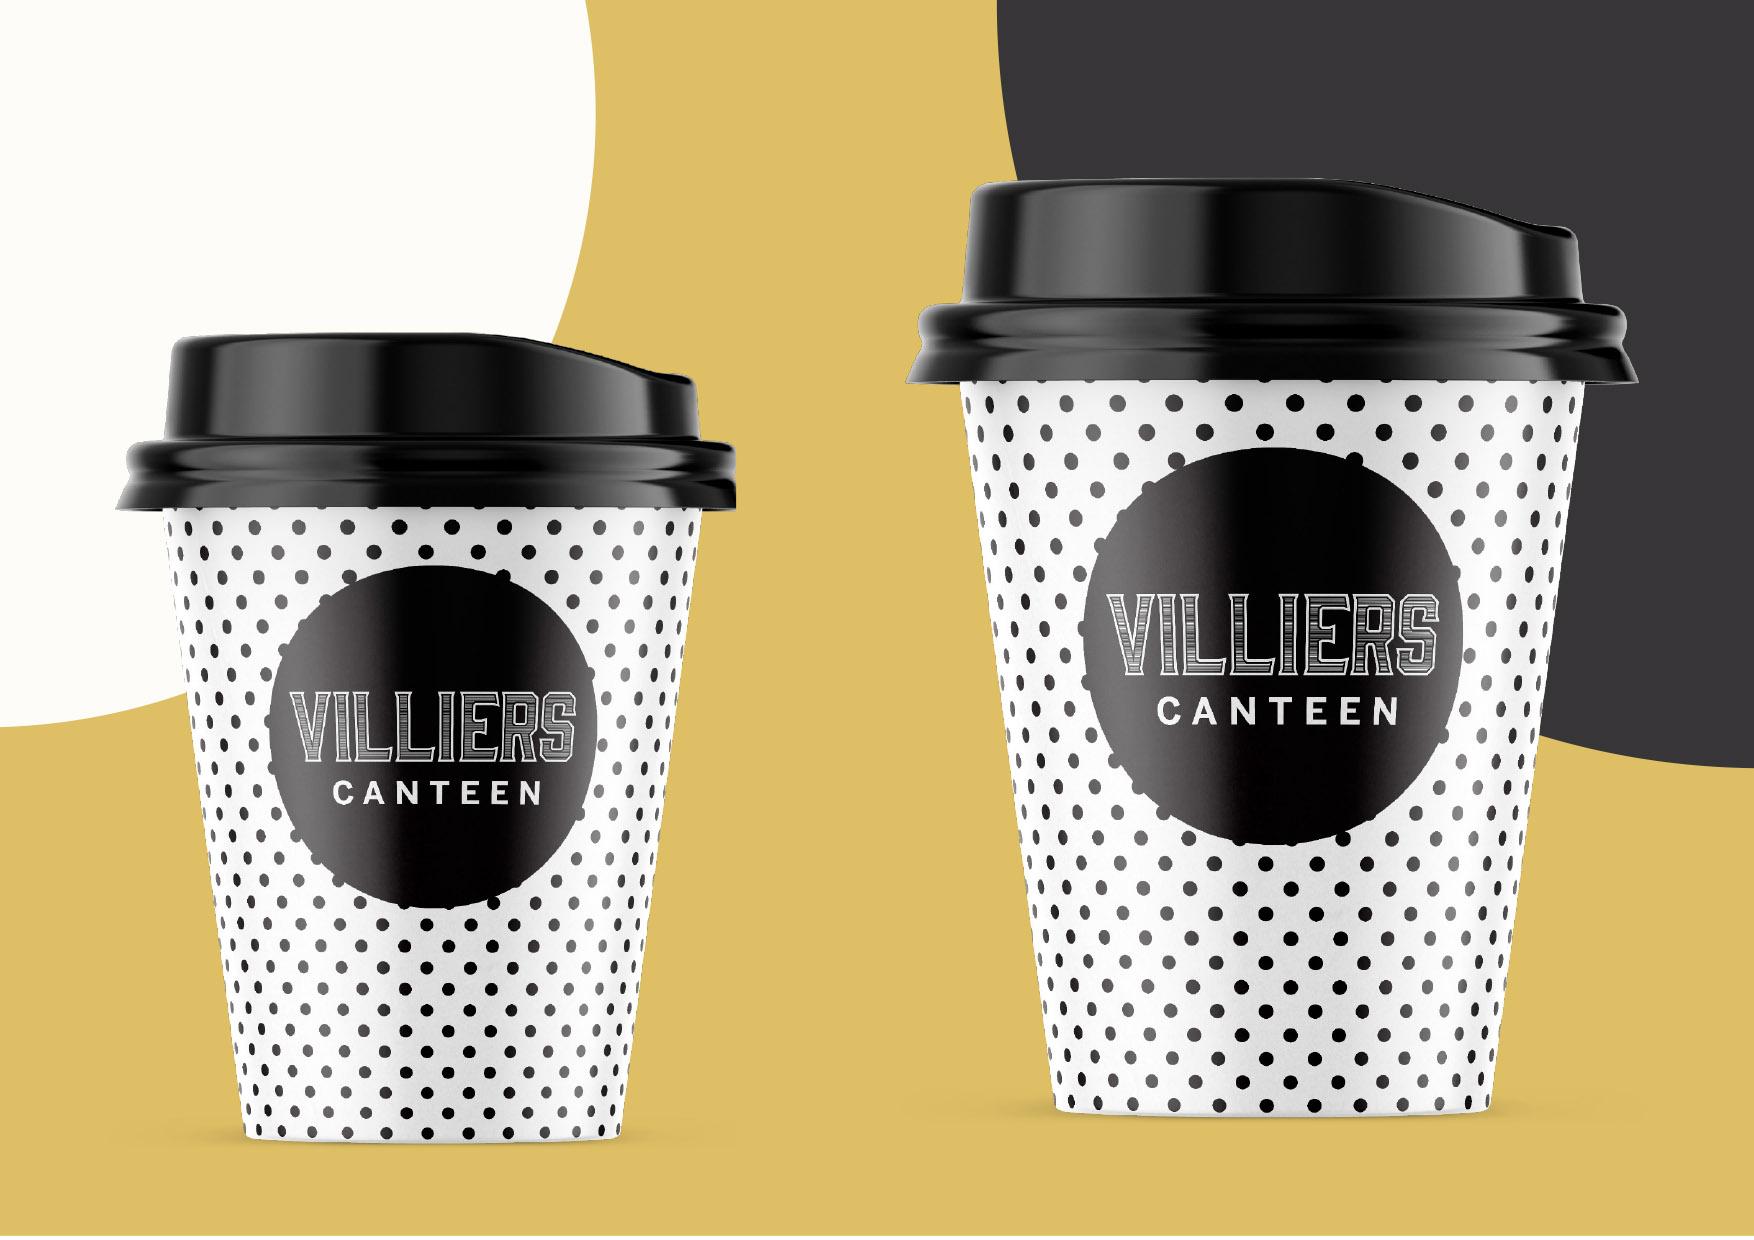 Handle-Branding-Villiers-Street-Canteen-Rebranding_02_0006_Vector Smart Object.jpg